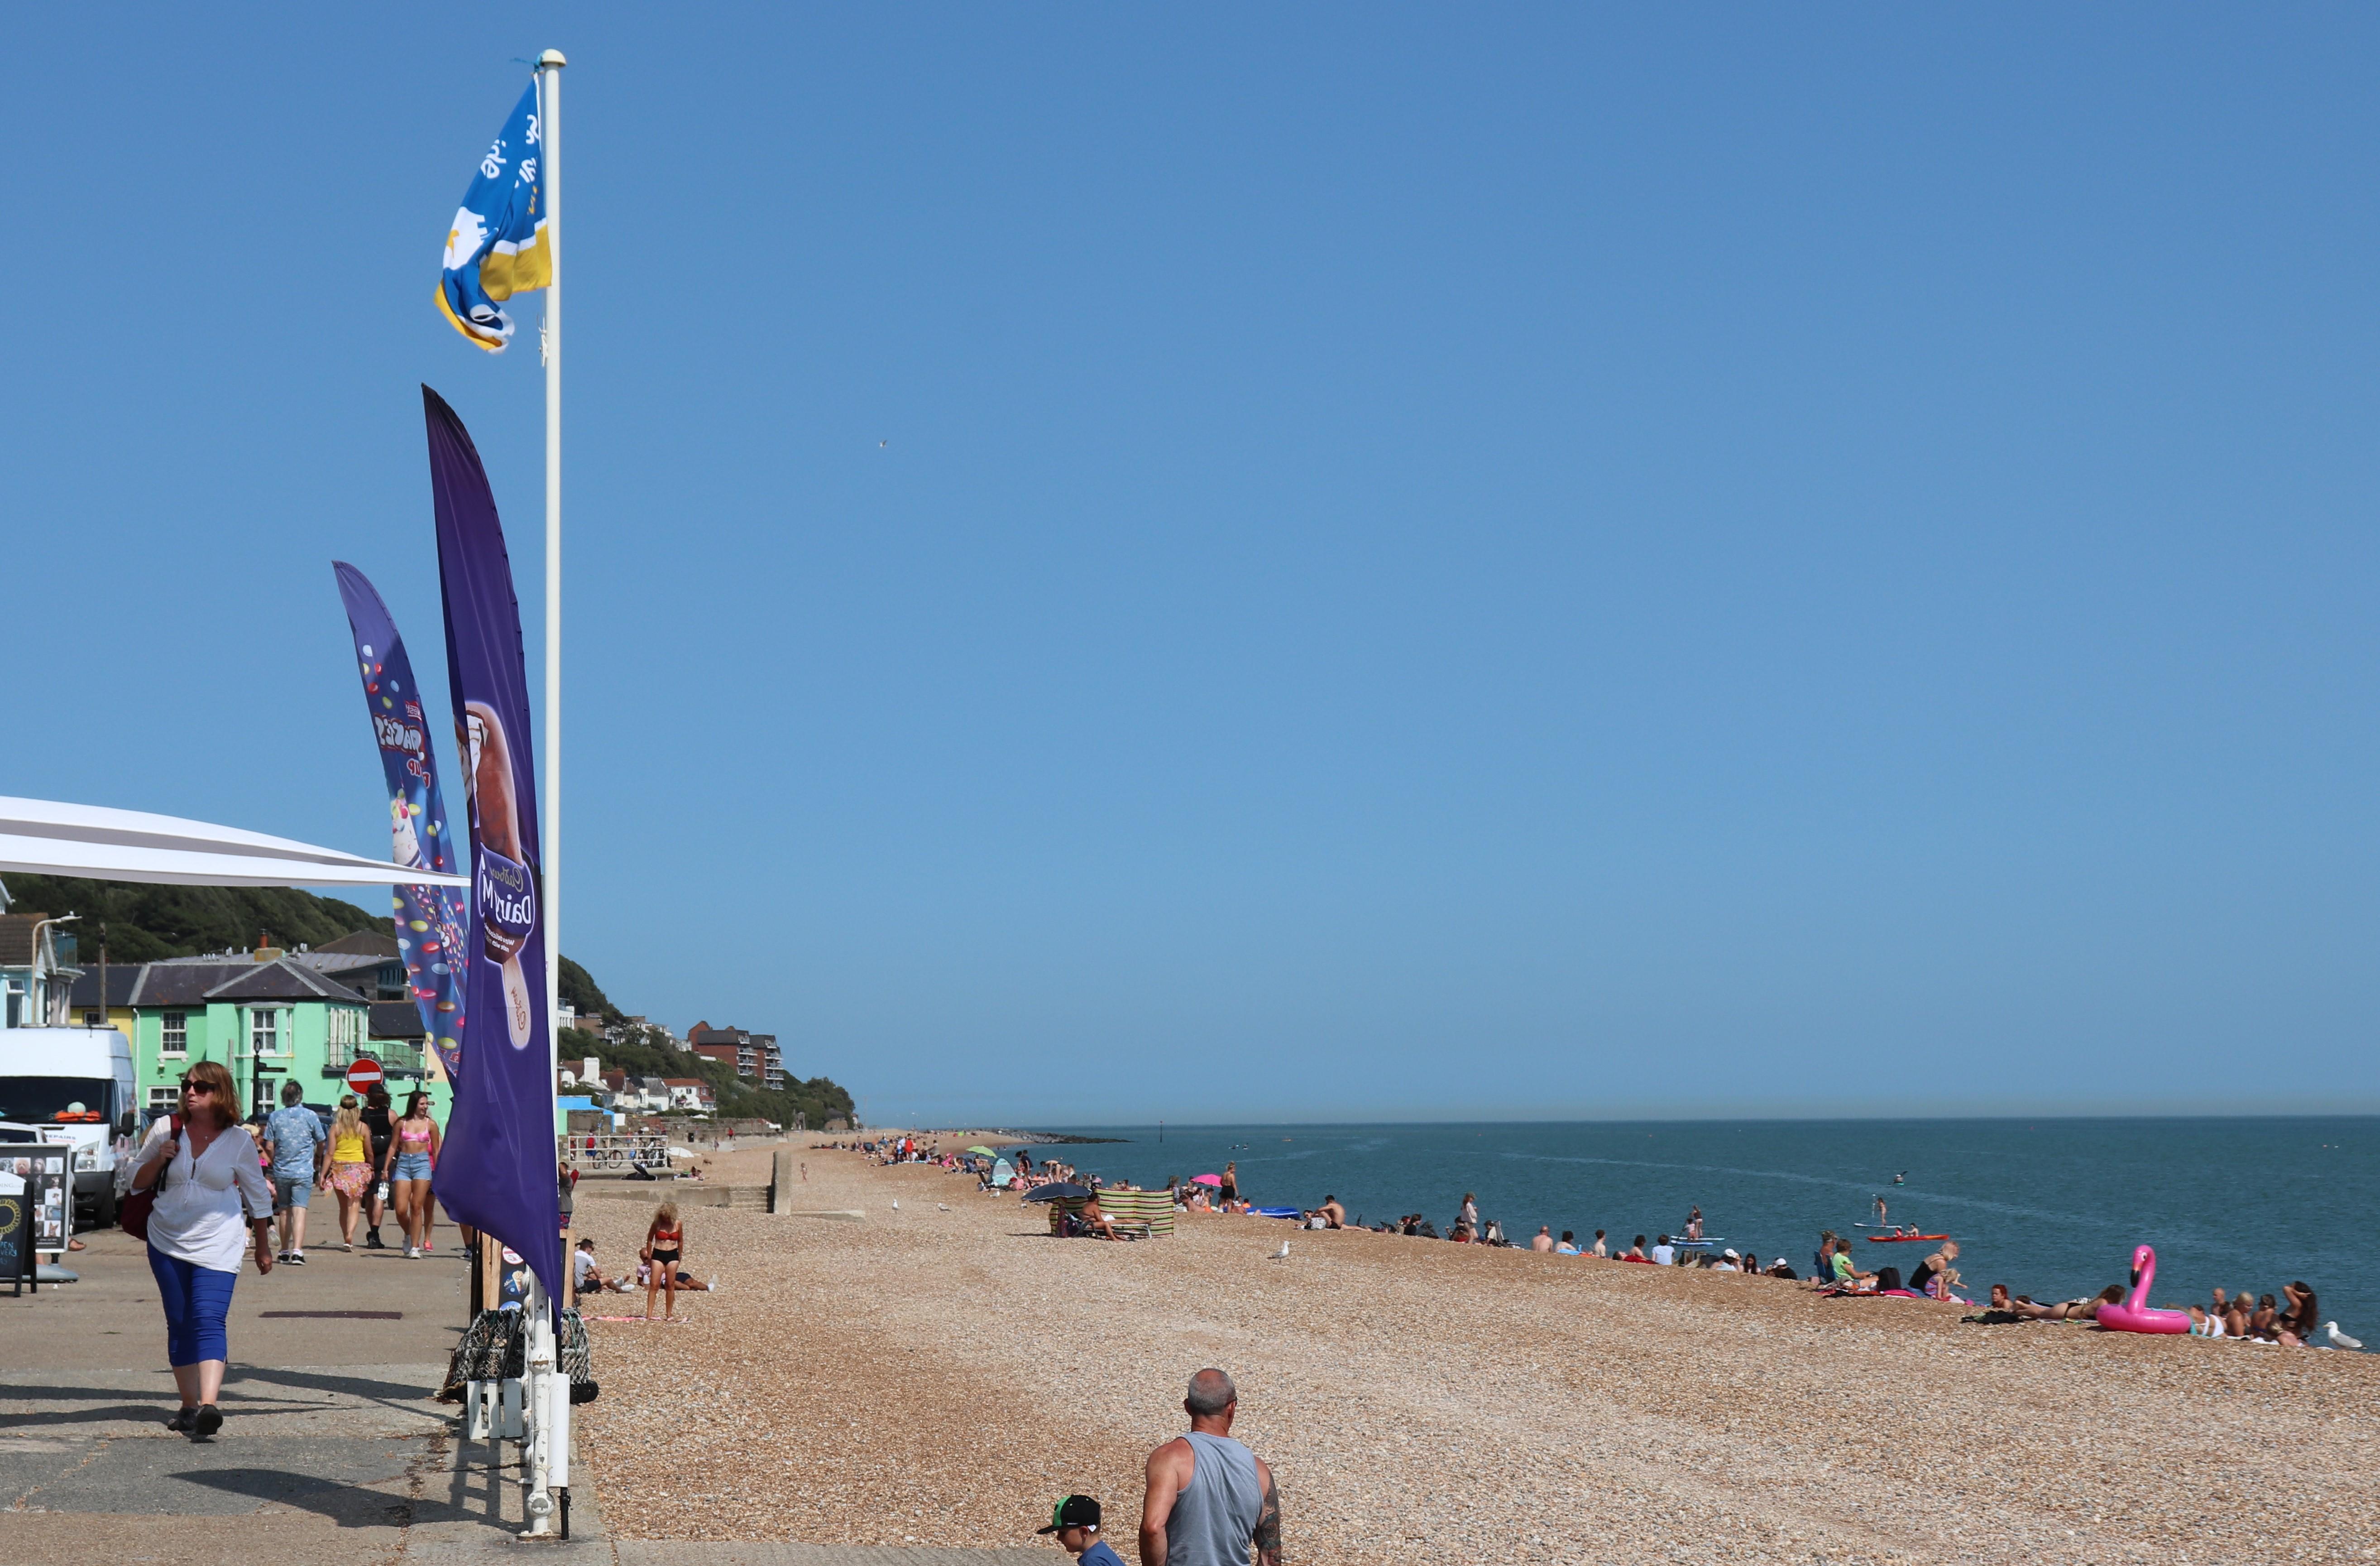 Sandgate Beach July 2020